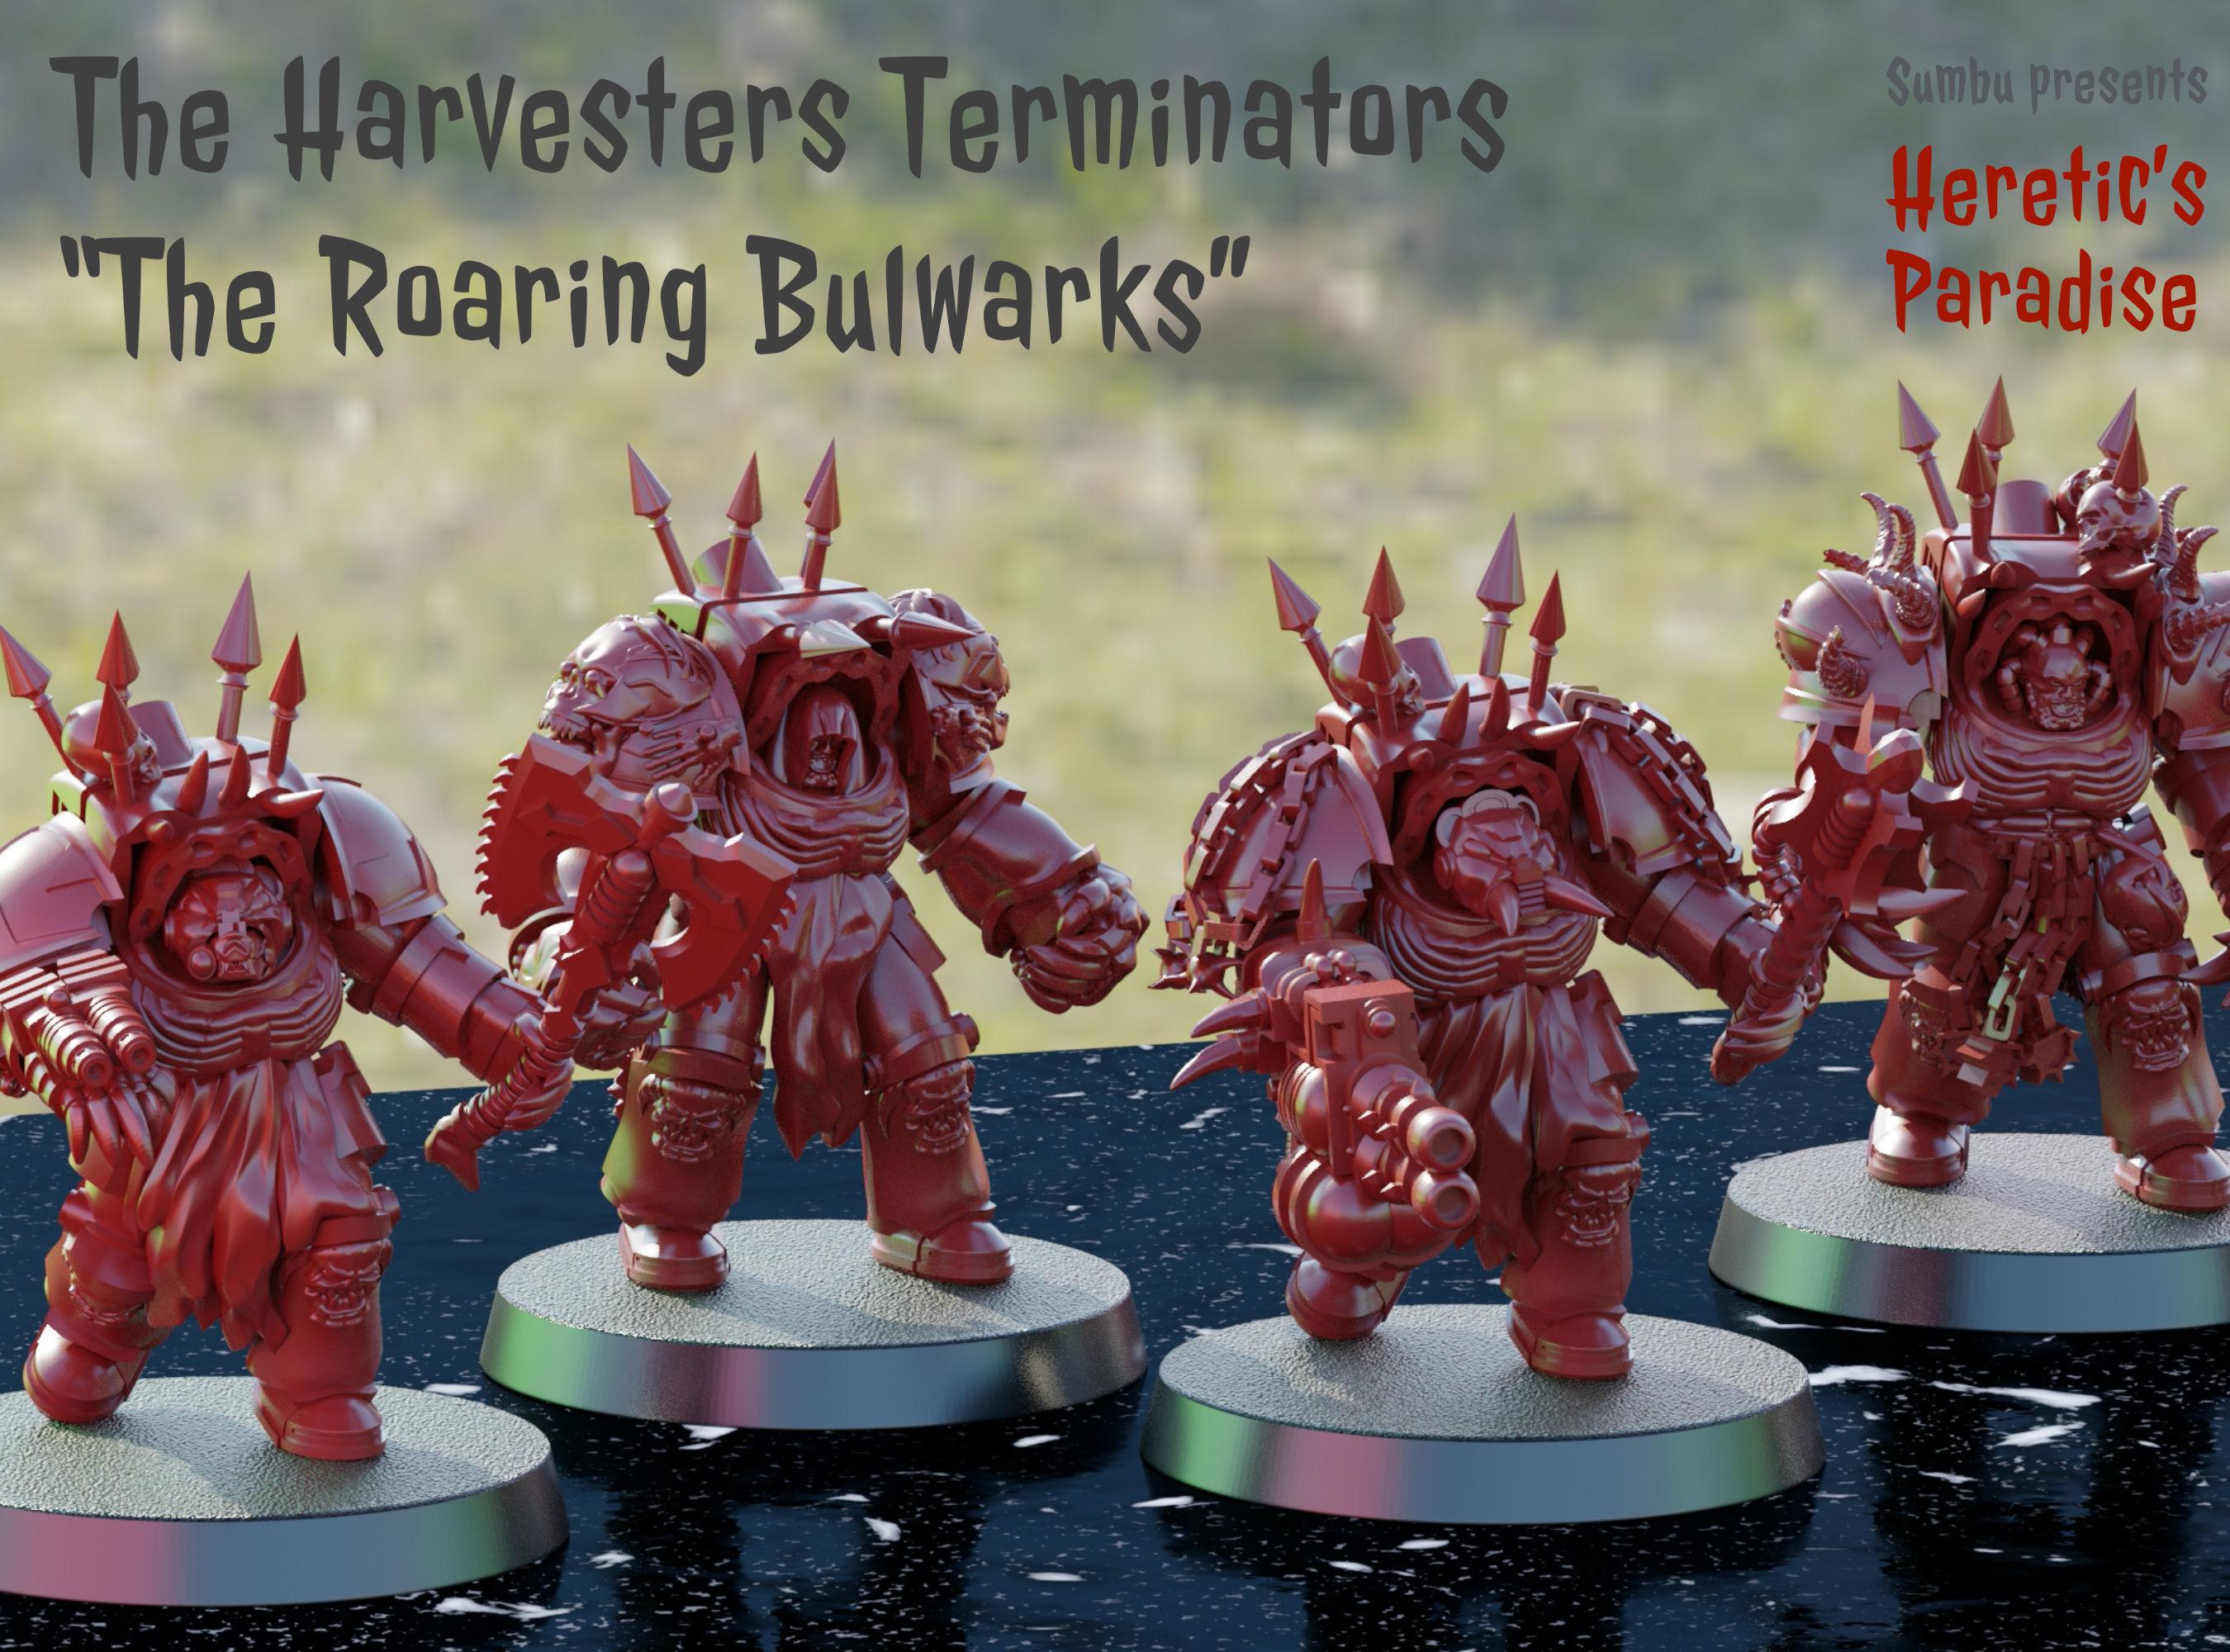 The Harvesters - Roaring Bulwark - Bruins Pattern Terminators